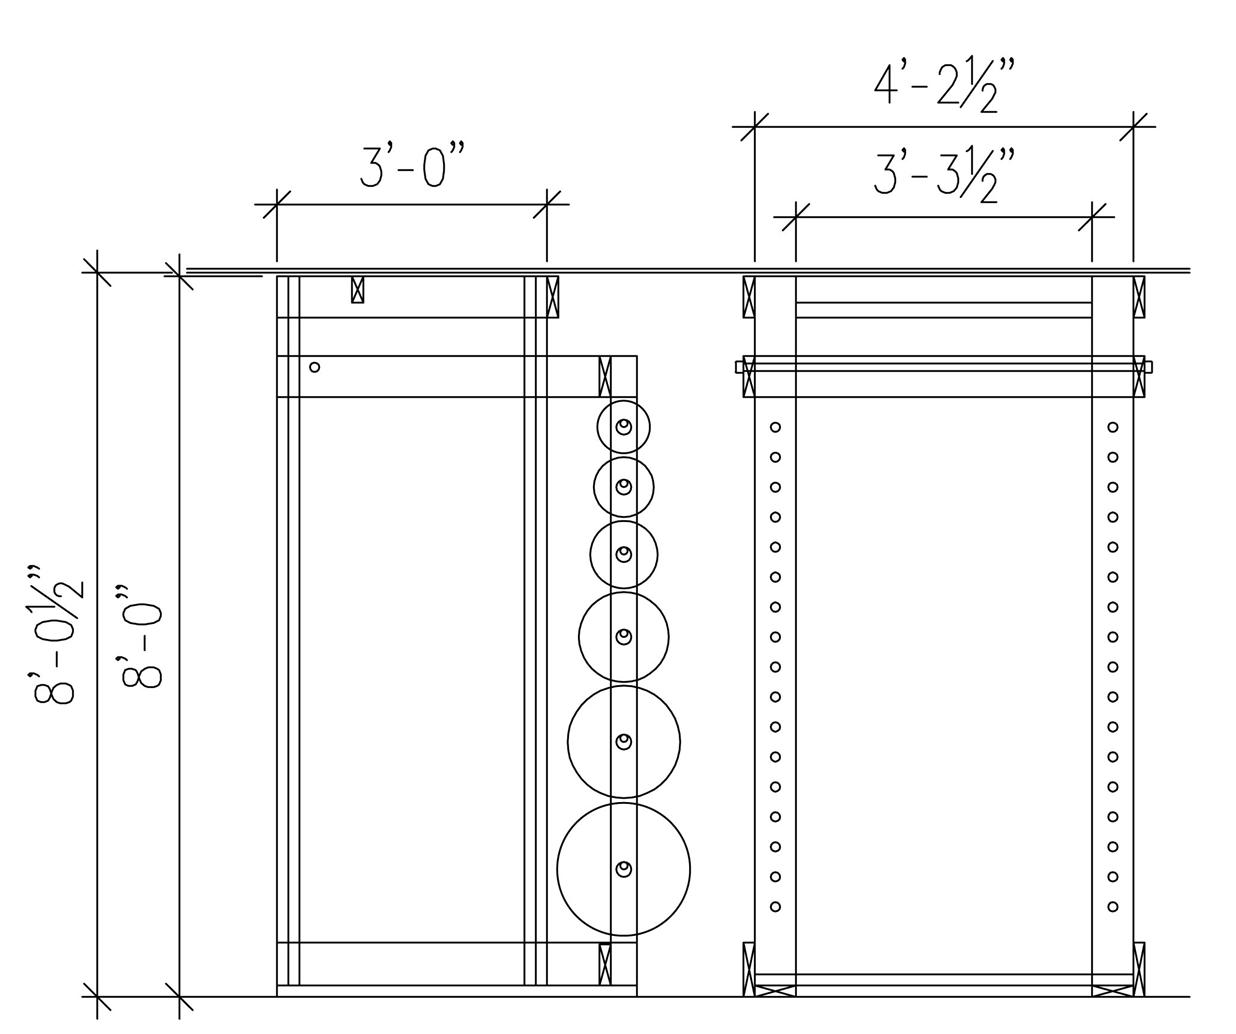 Homemade power rack photos for Power rack design plans